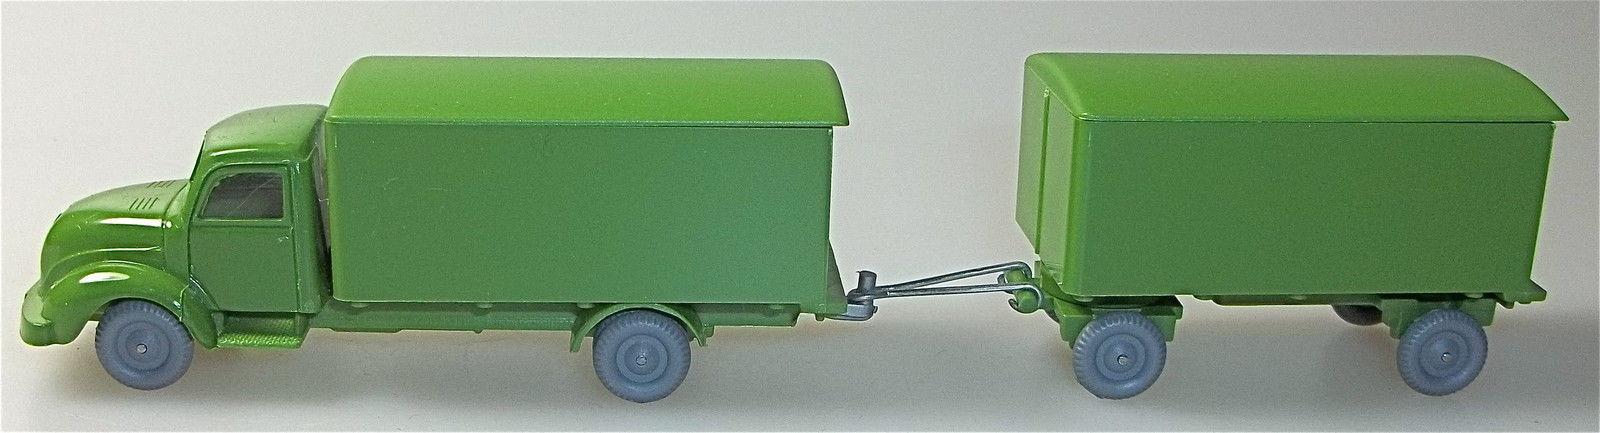 Thyssengreener Magirus camión Capó redondeado Tren De Carretera Sin imprimir imu